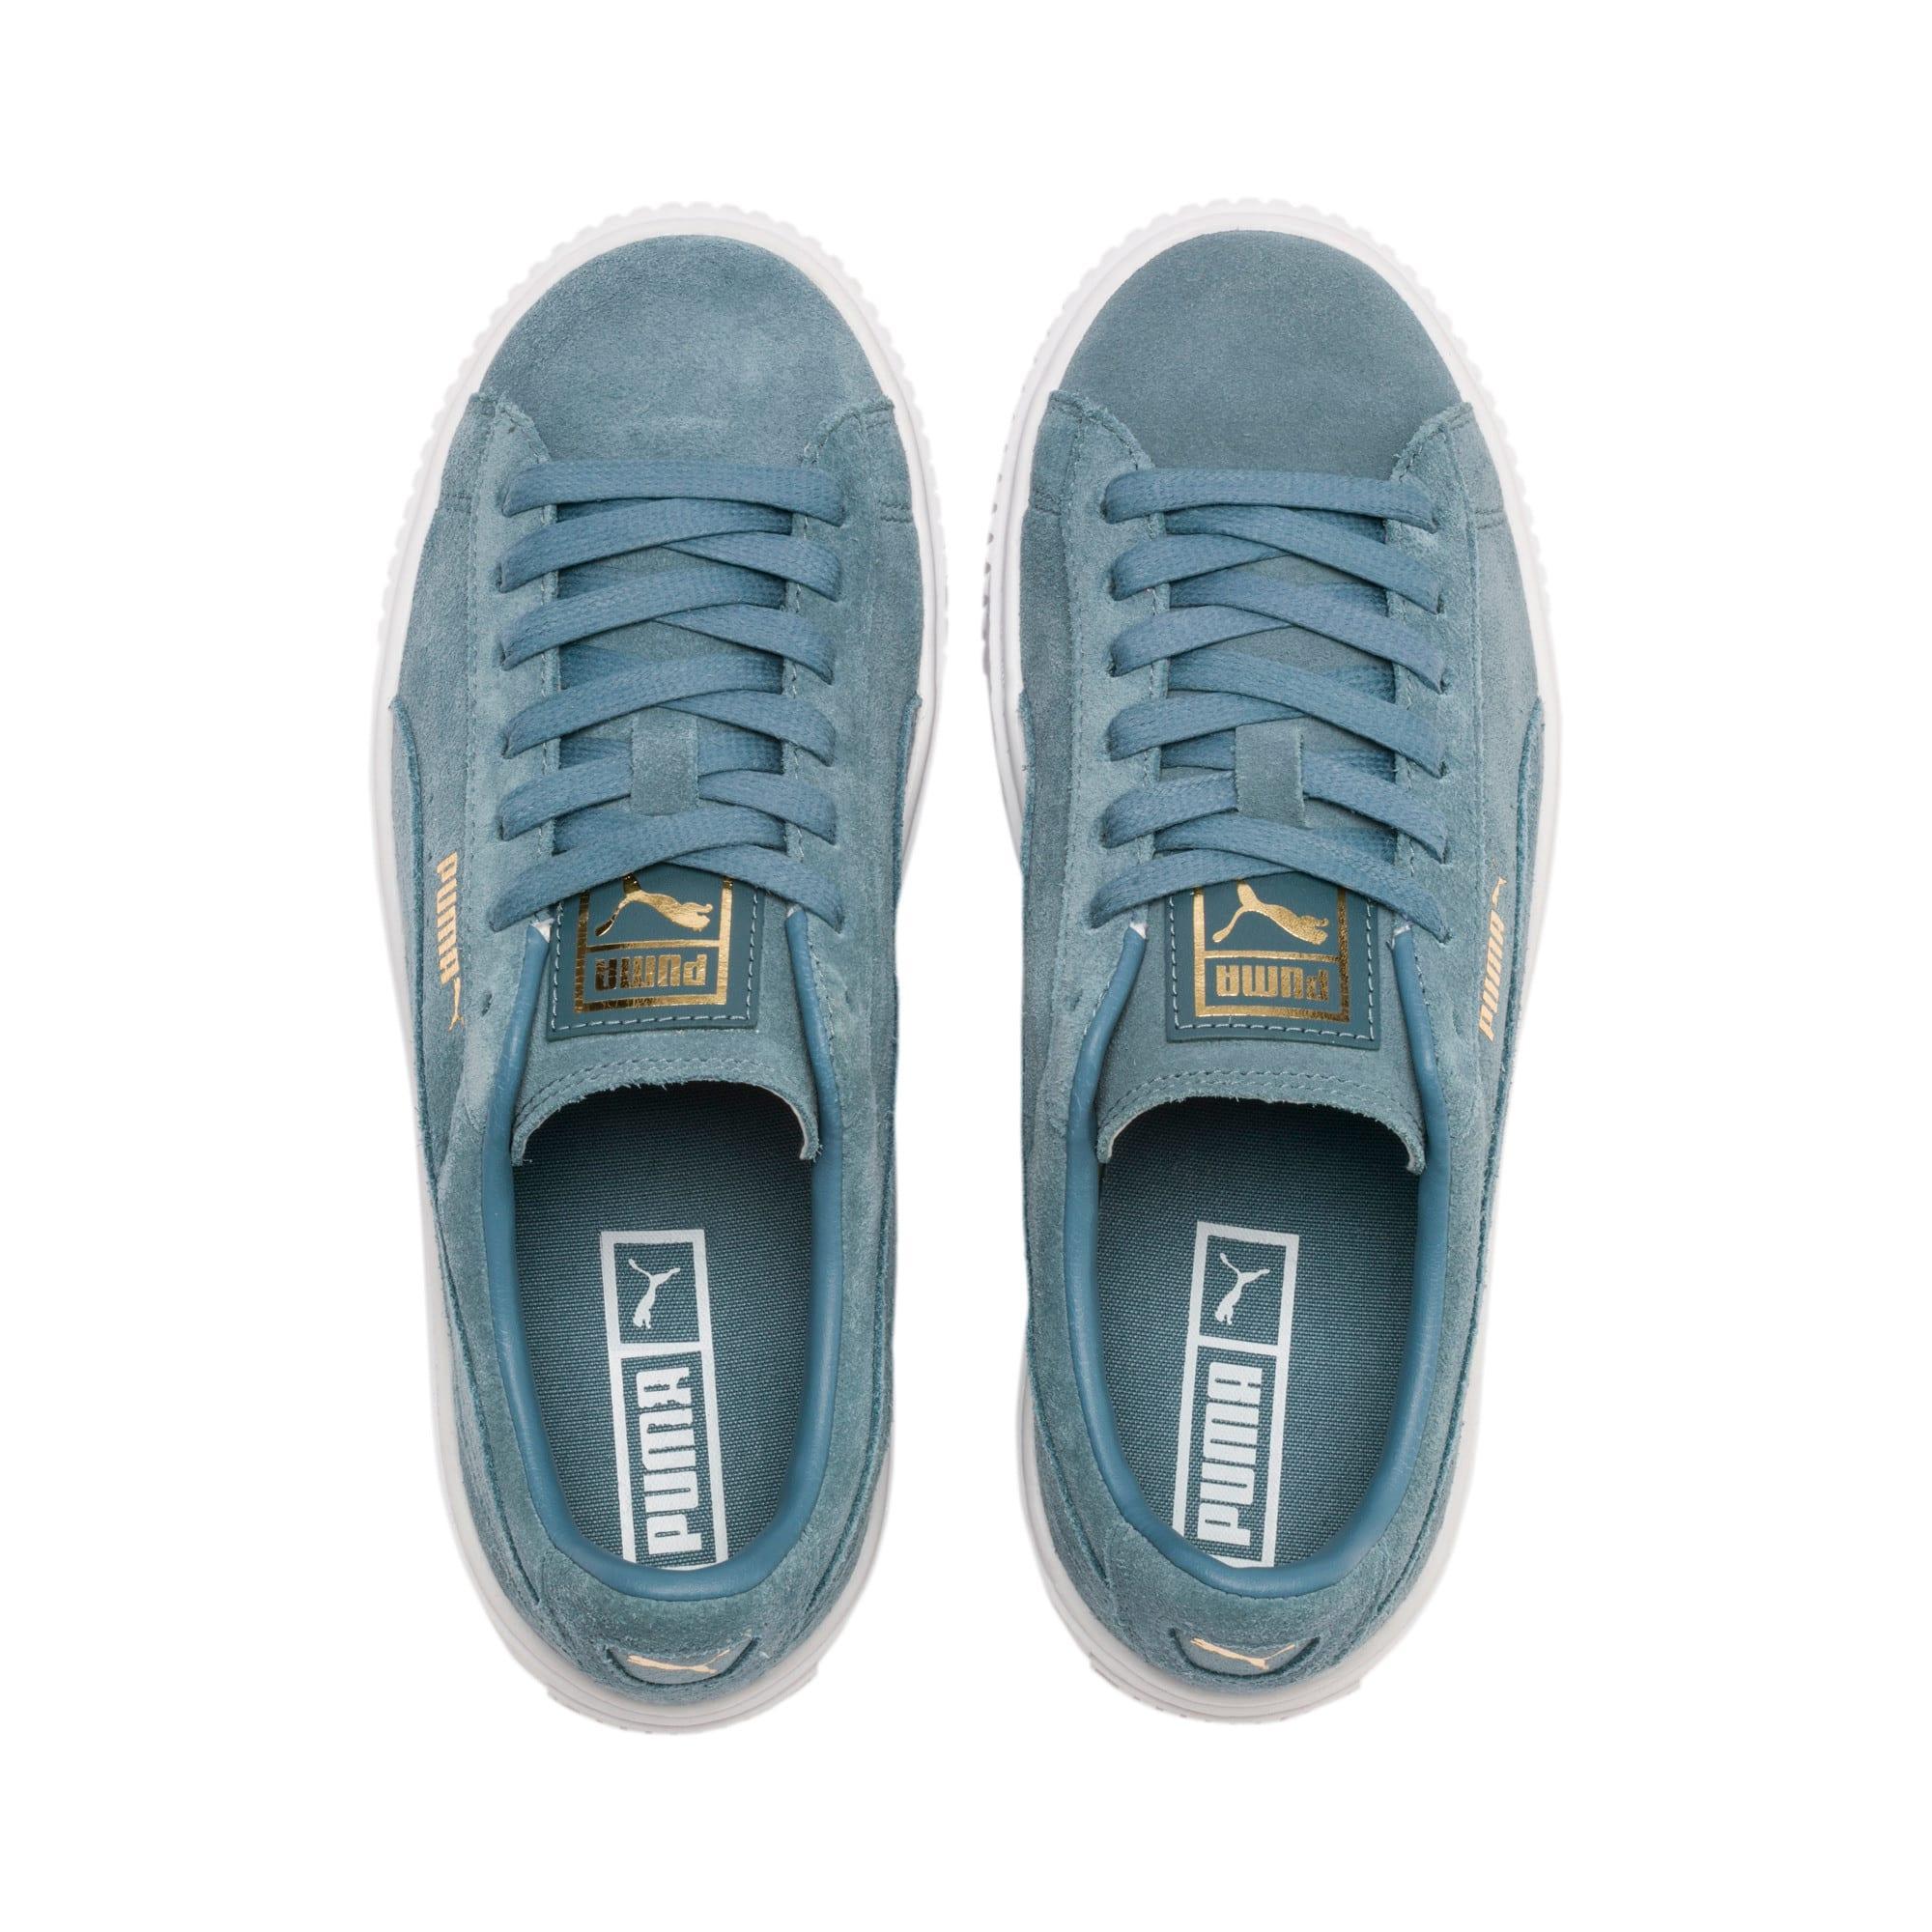 Thumbnail 7 of Suede Platform Women's Sneakers, Bluestone-Puma Team Gold, medium